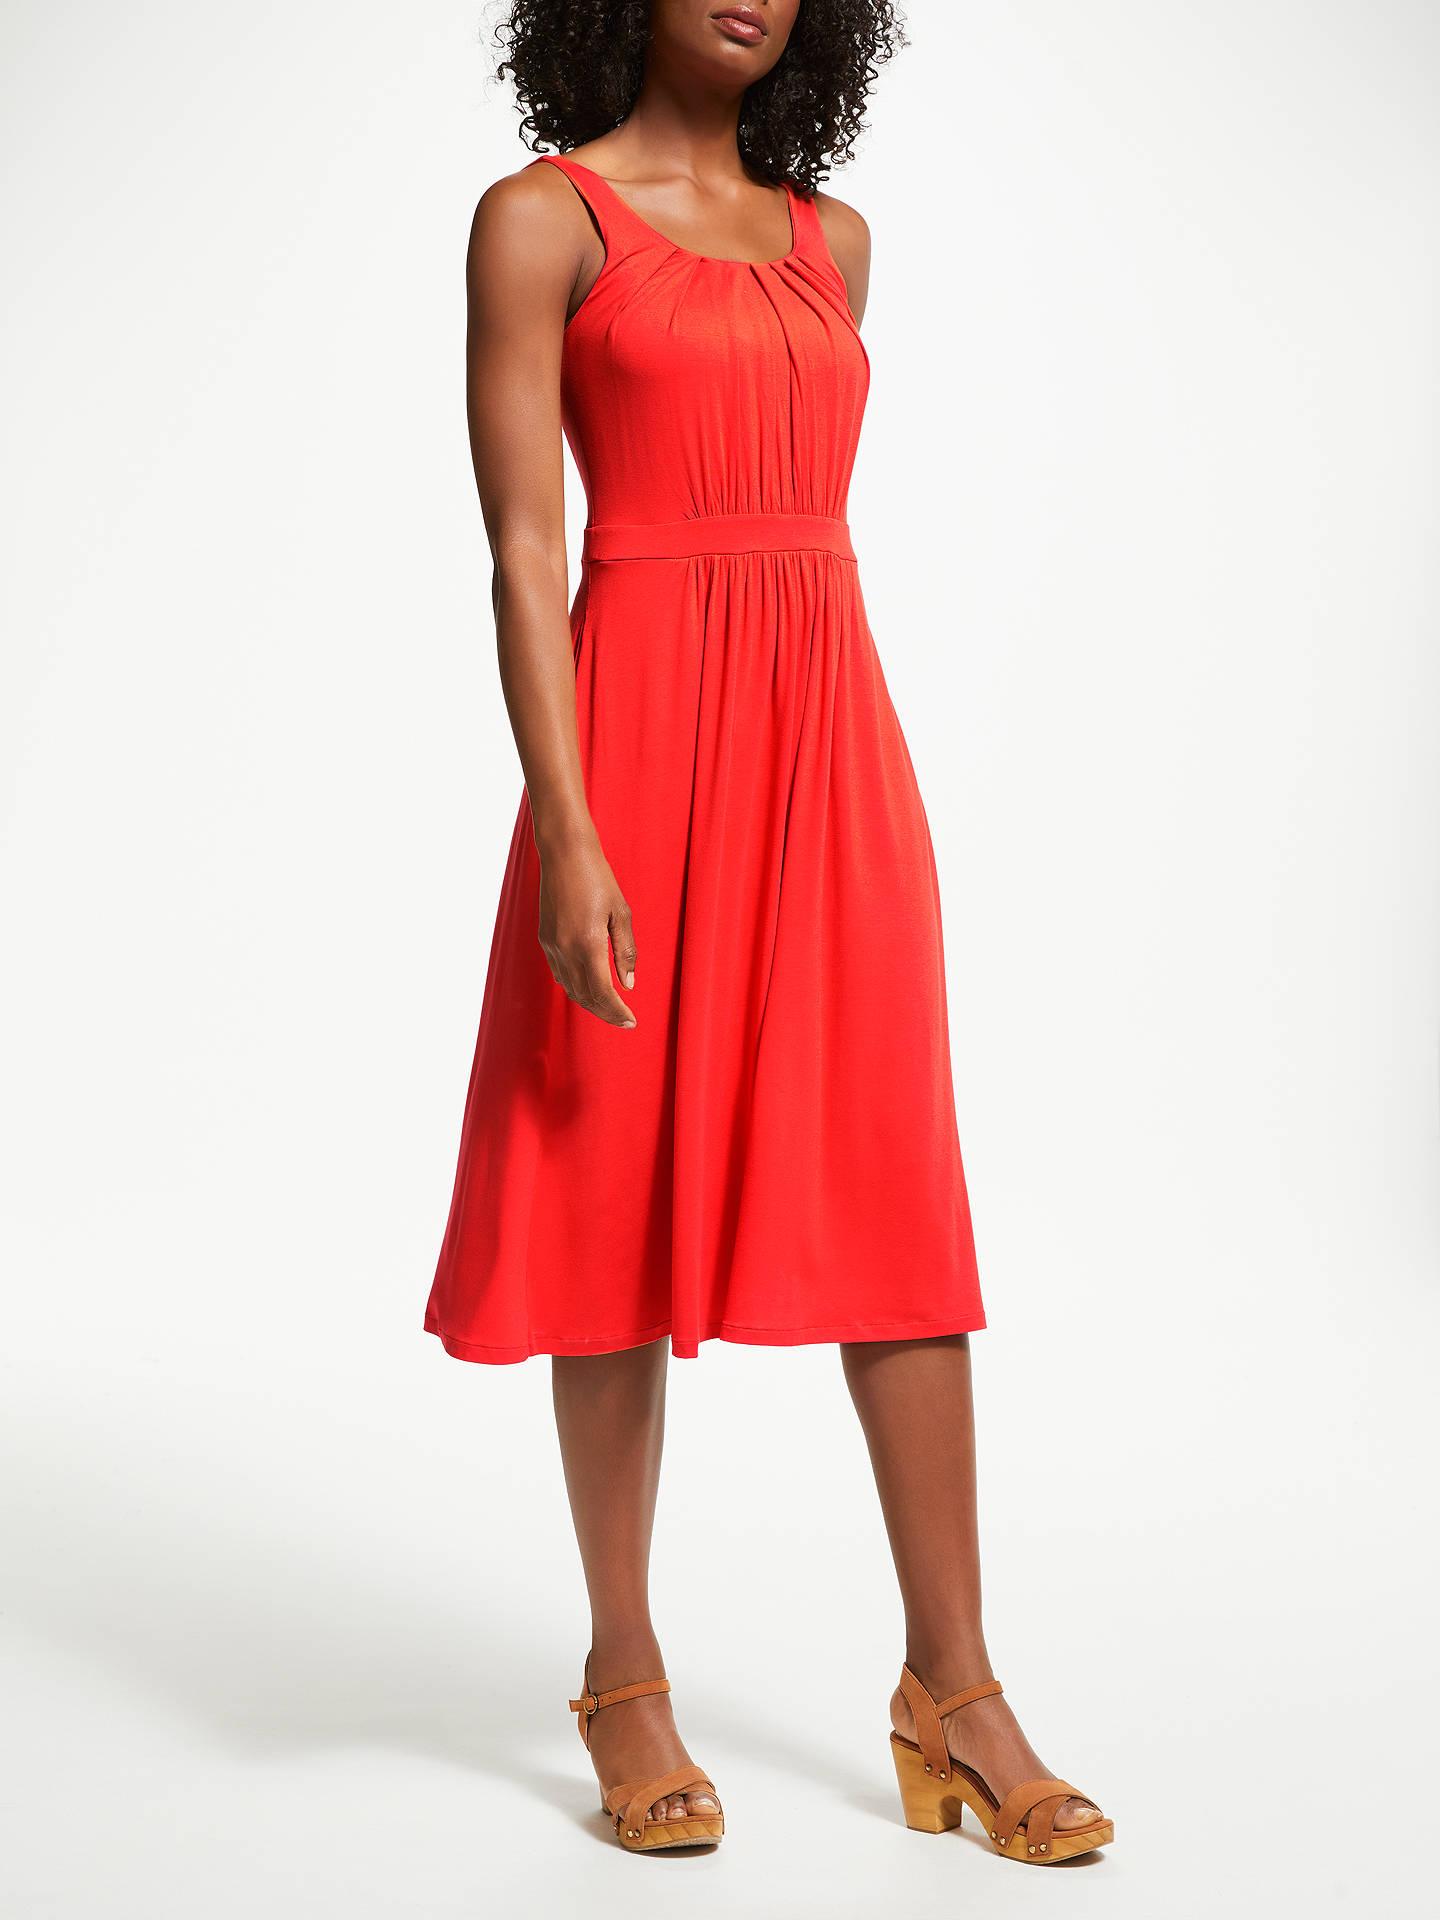 Boden Emmie Jersey Dress Blood Orange At John Lewis Partners